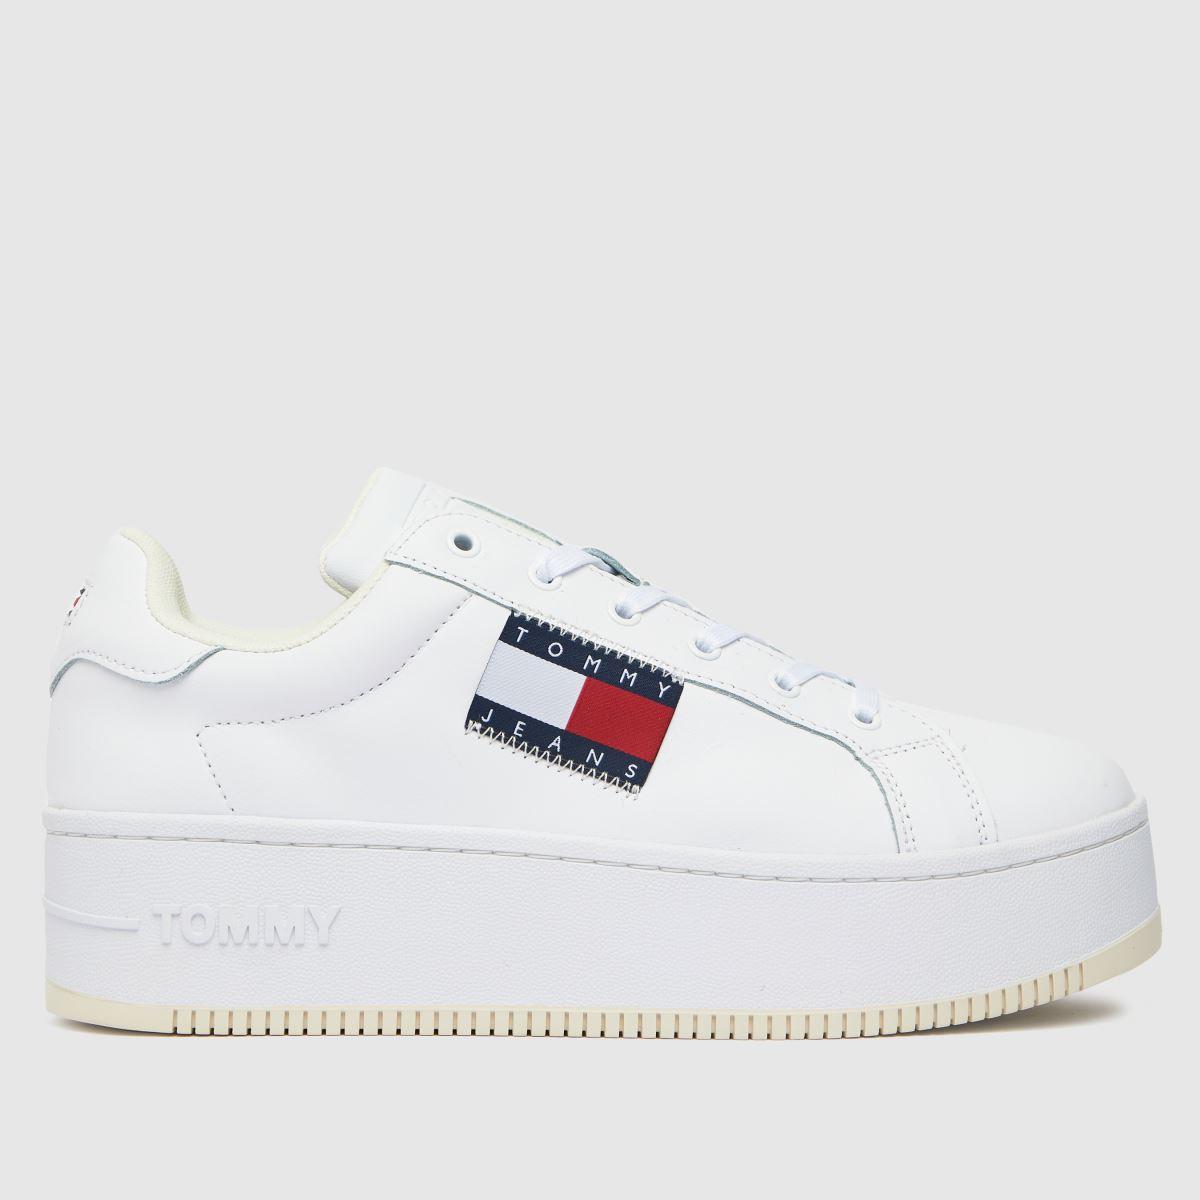 Tommy Hilfiger White Flatform Flag Sneaker Trainers